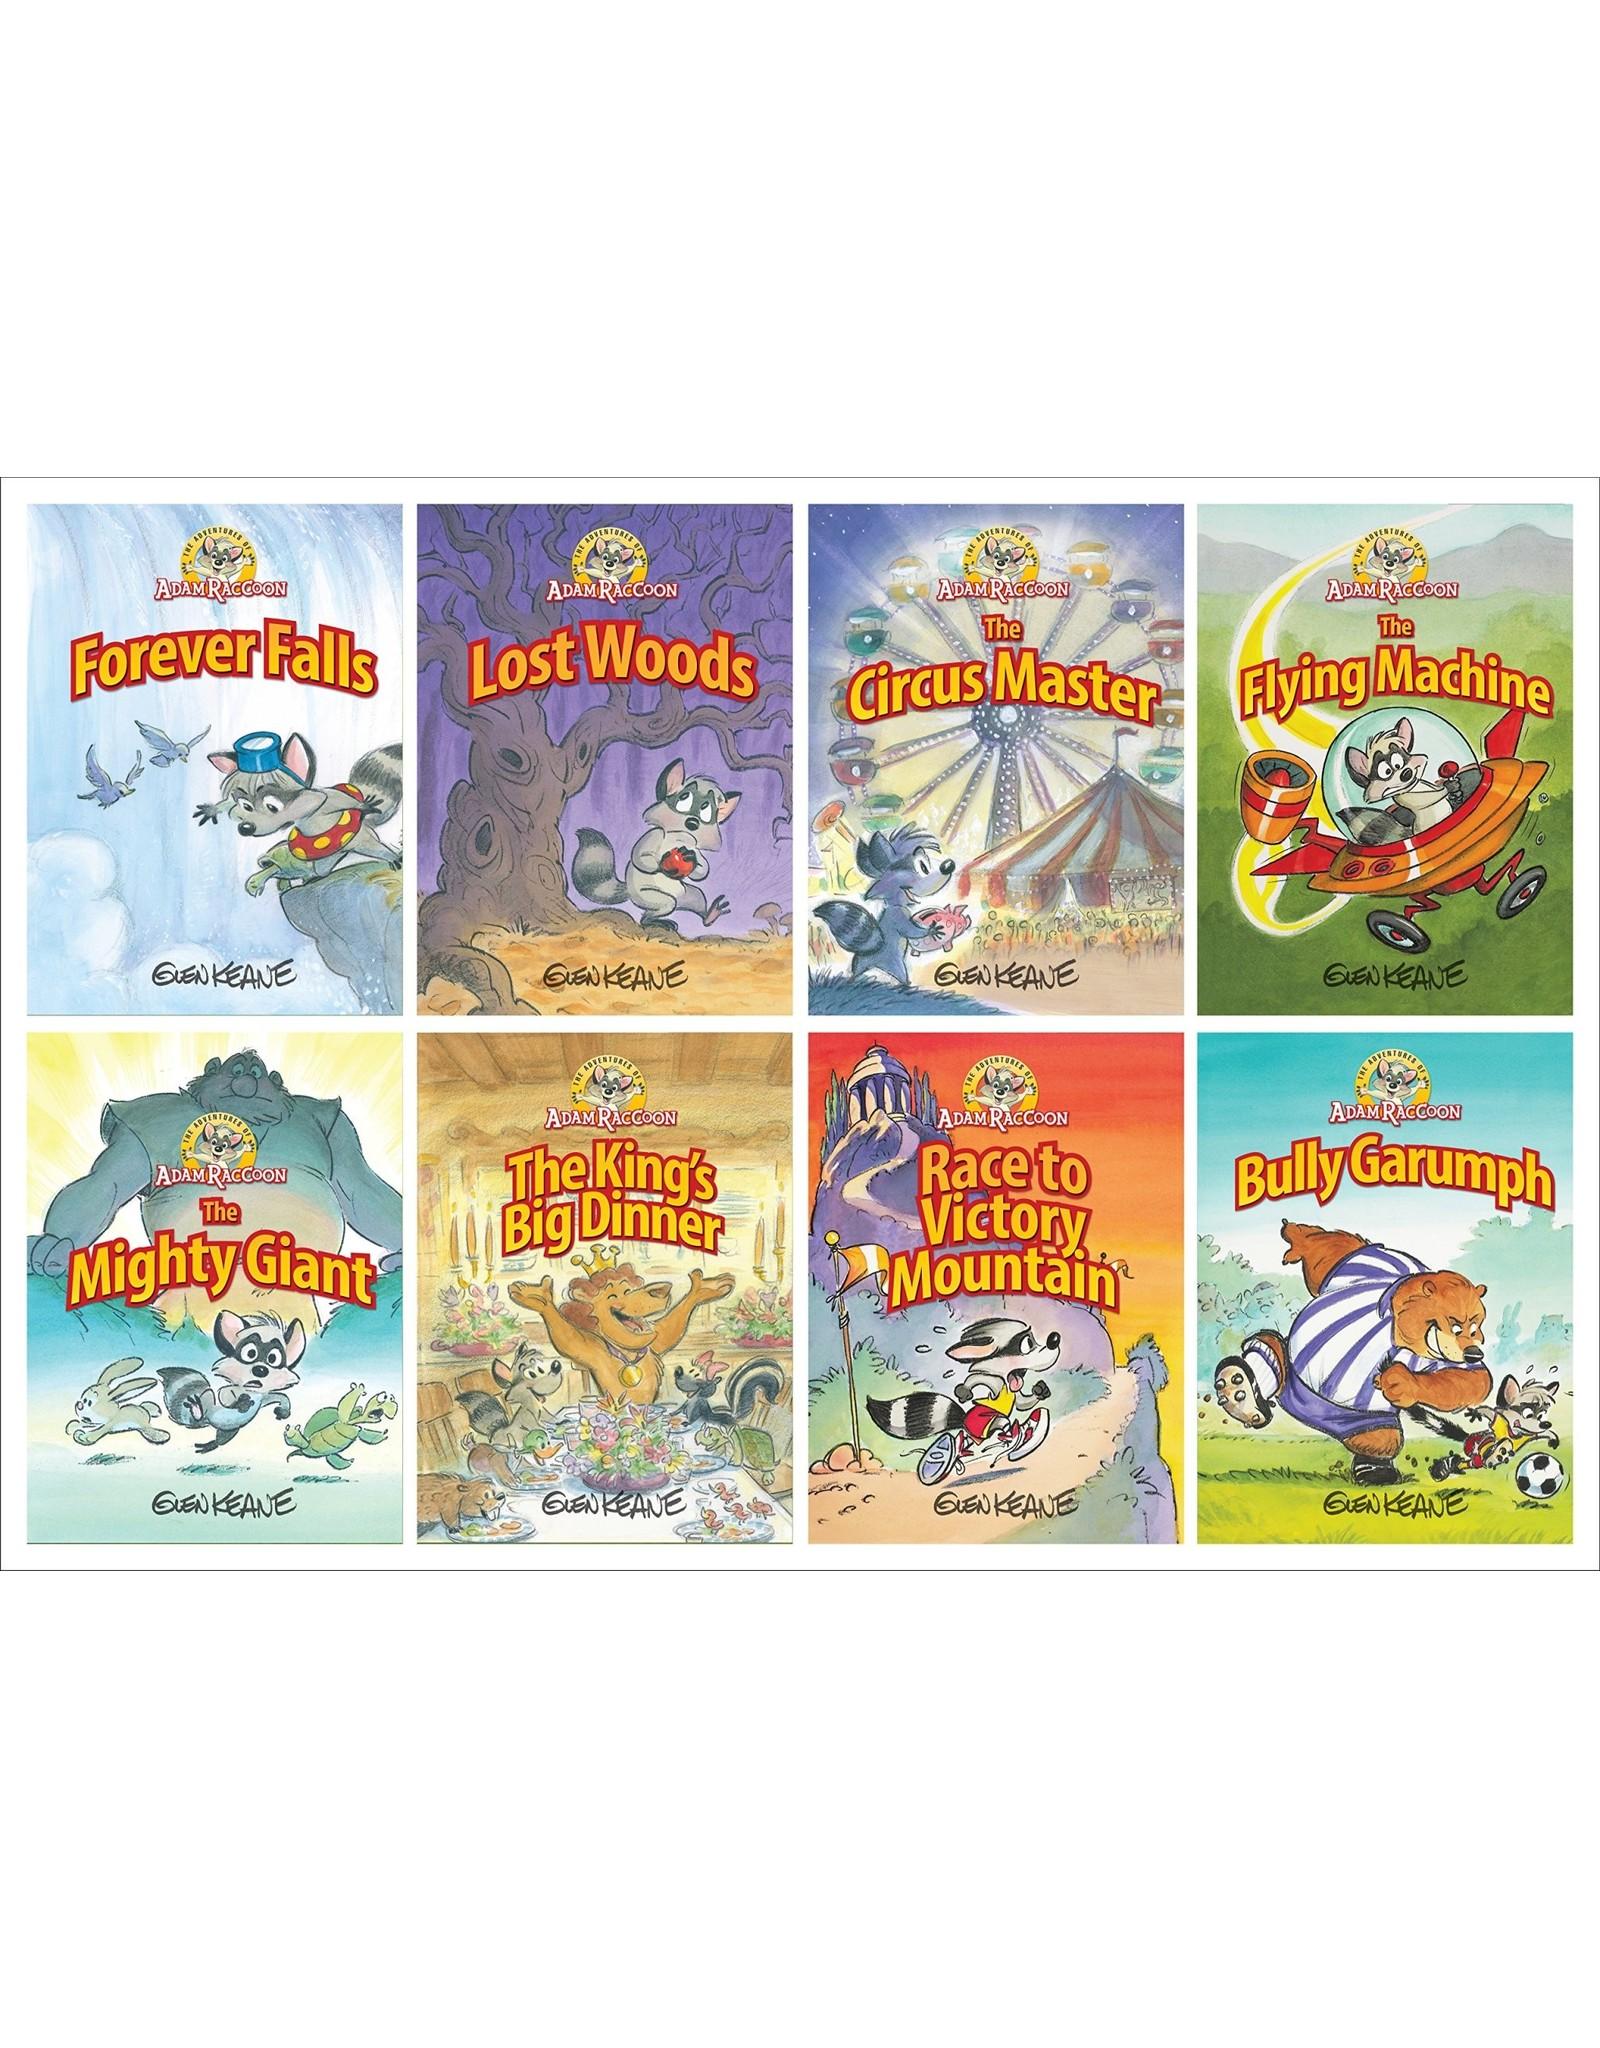 316 Publishing Adam Raccoon 8 volume set